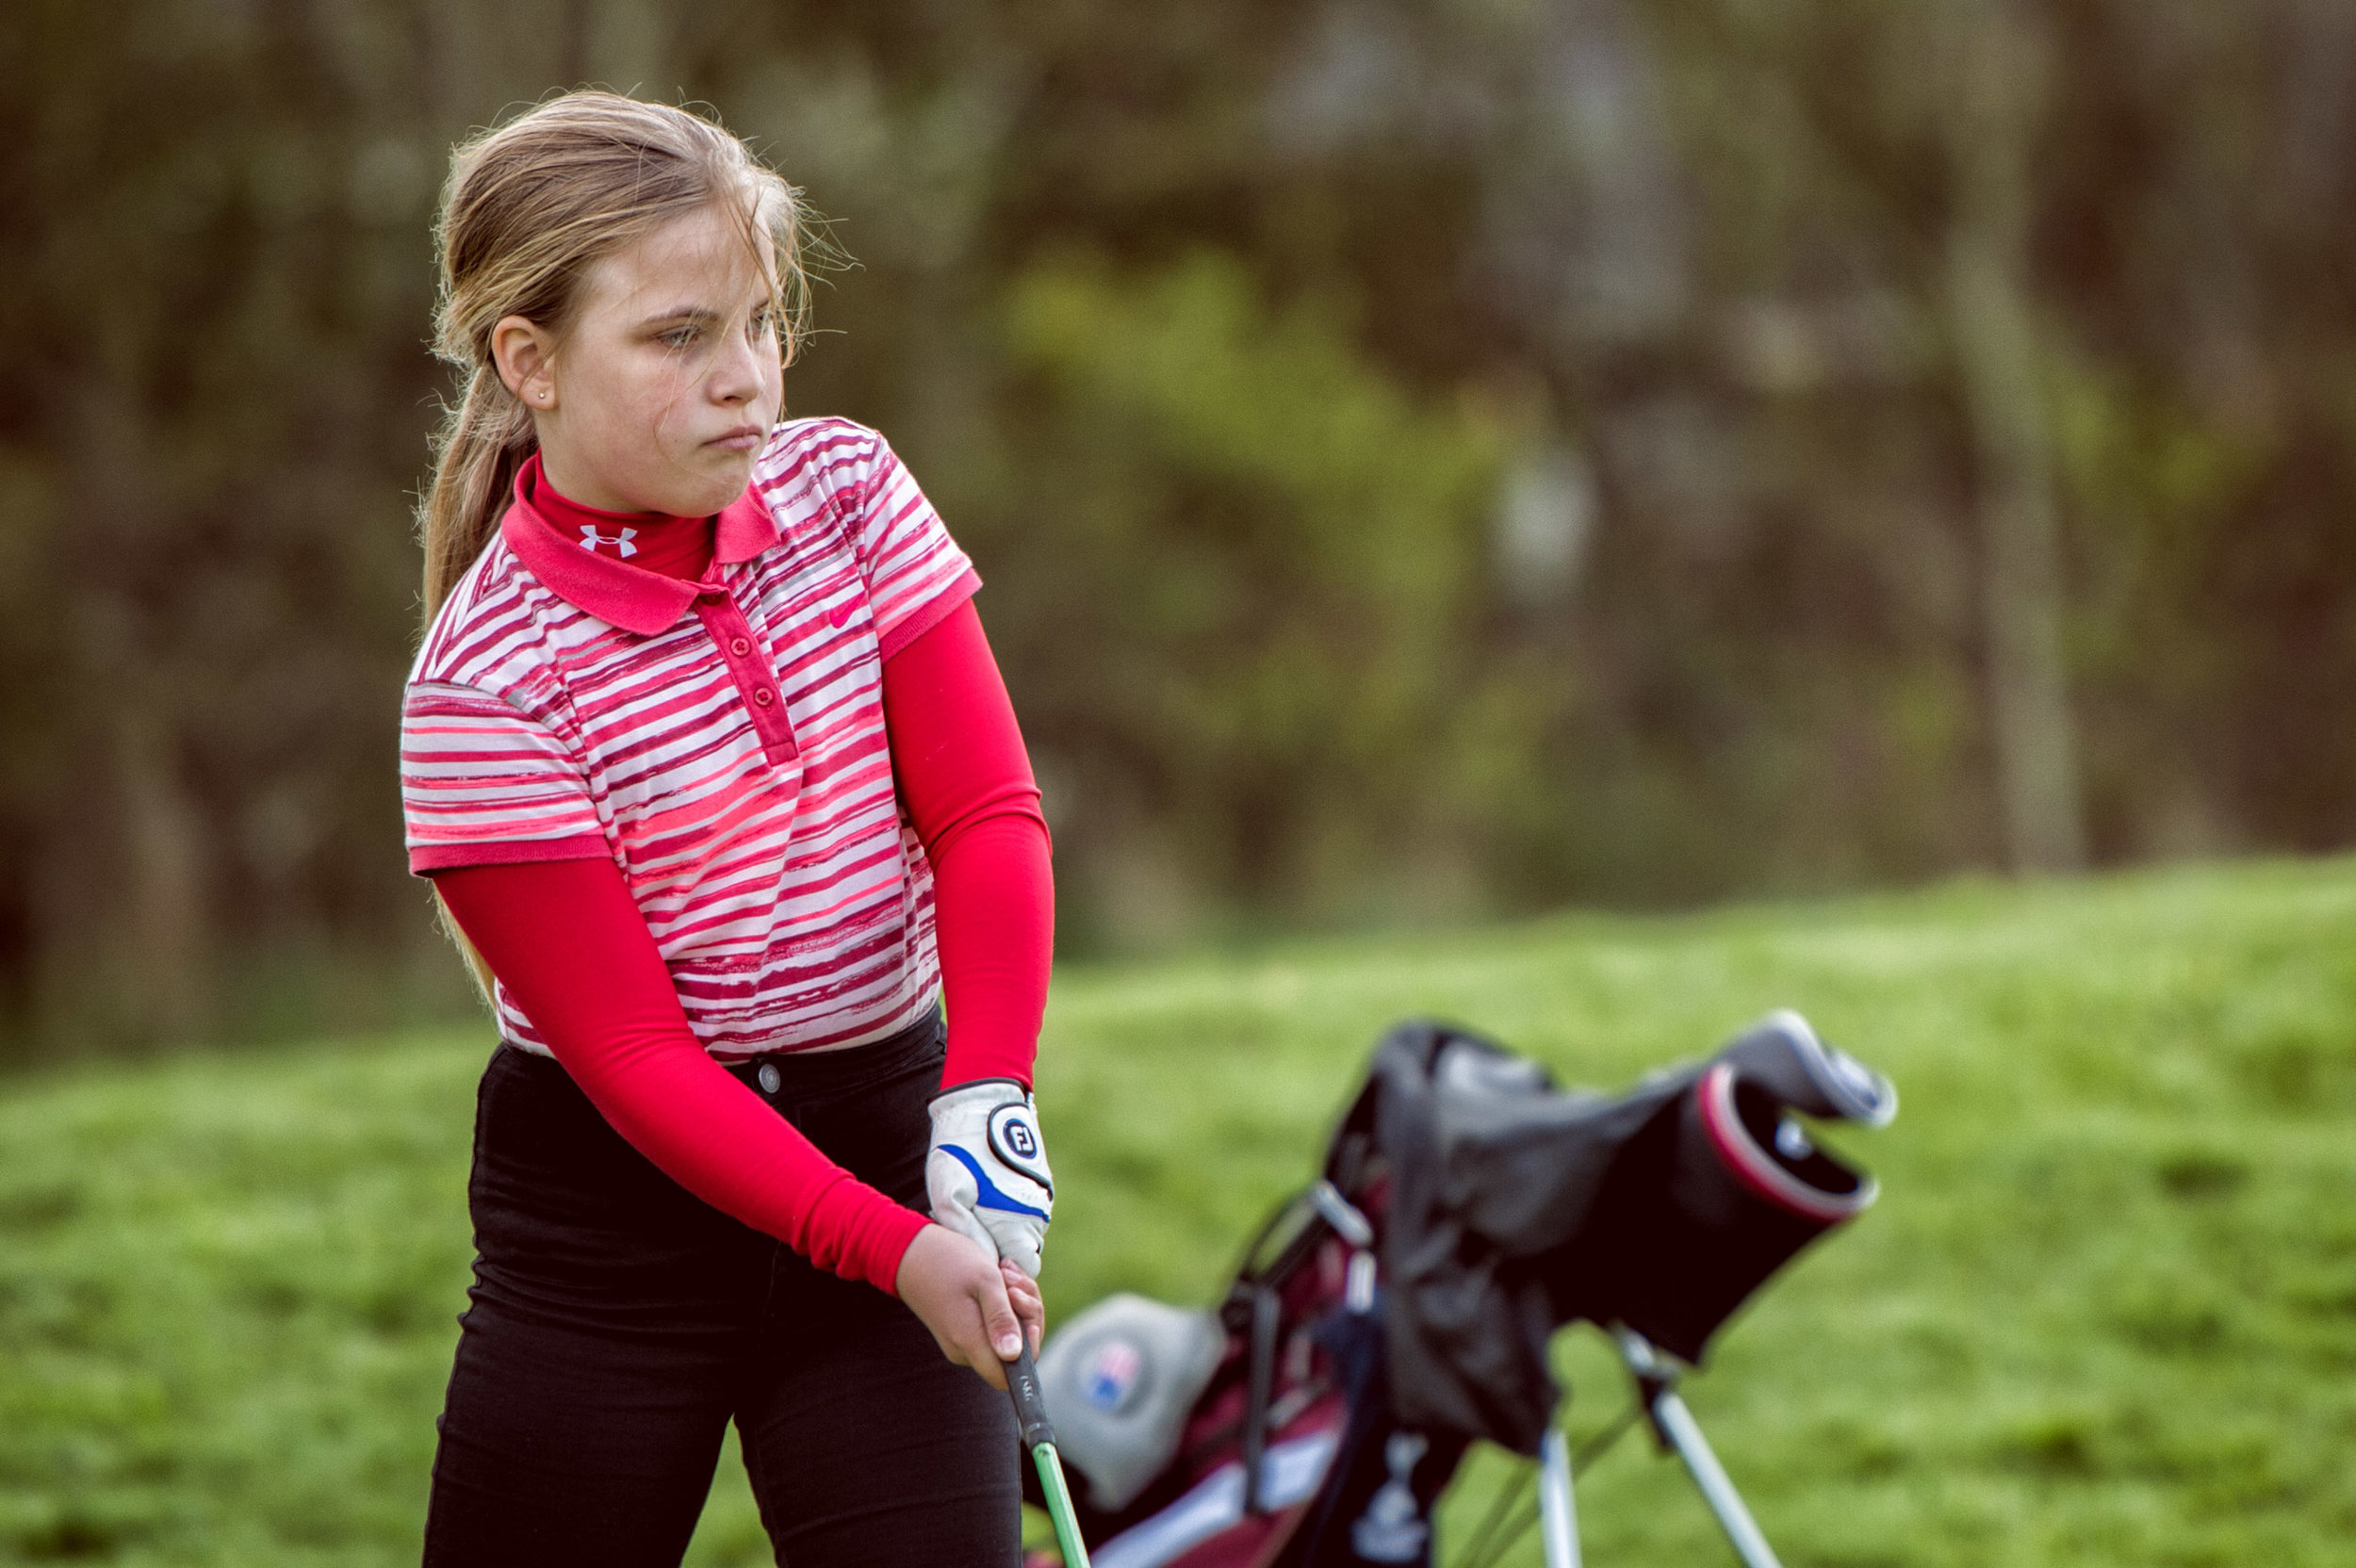 Russell Adams Golf Academy Junior Aniko Towers Golf Photo-492.jpg